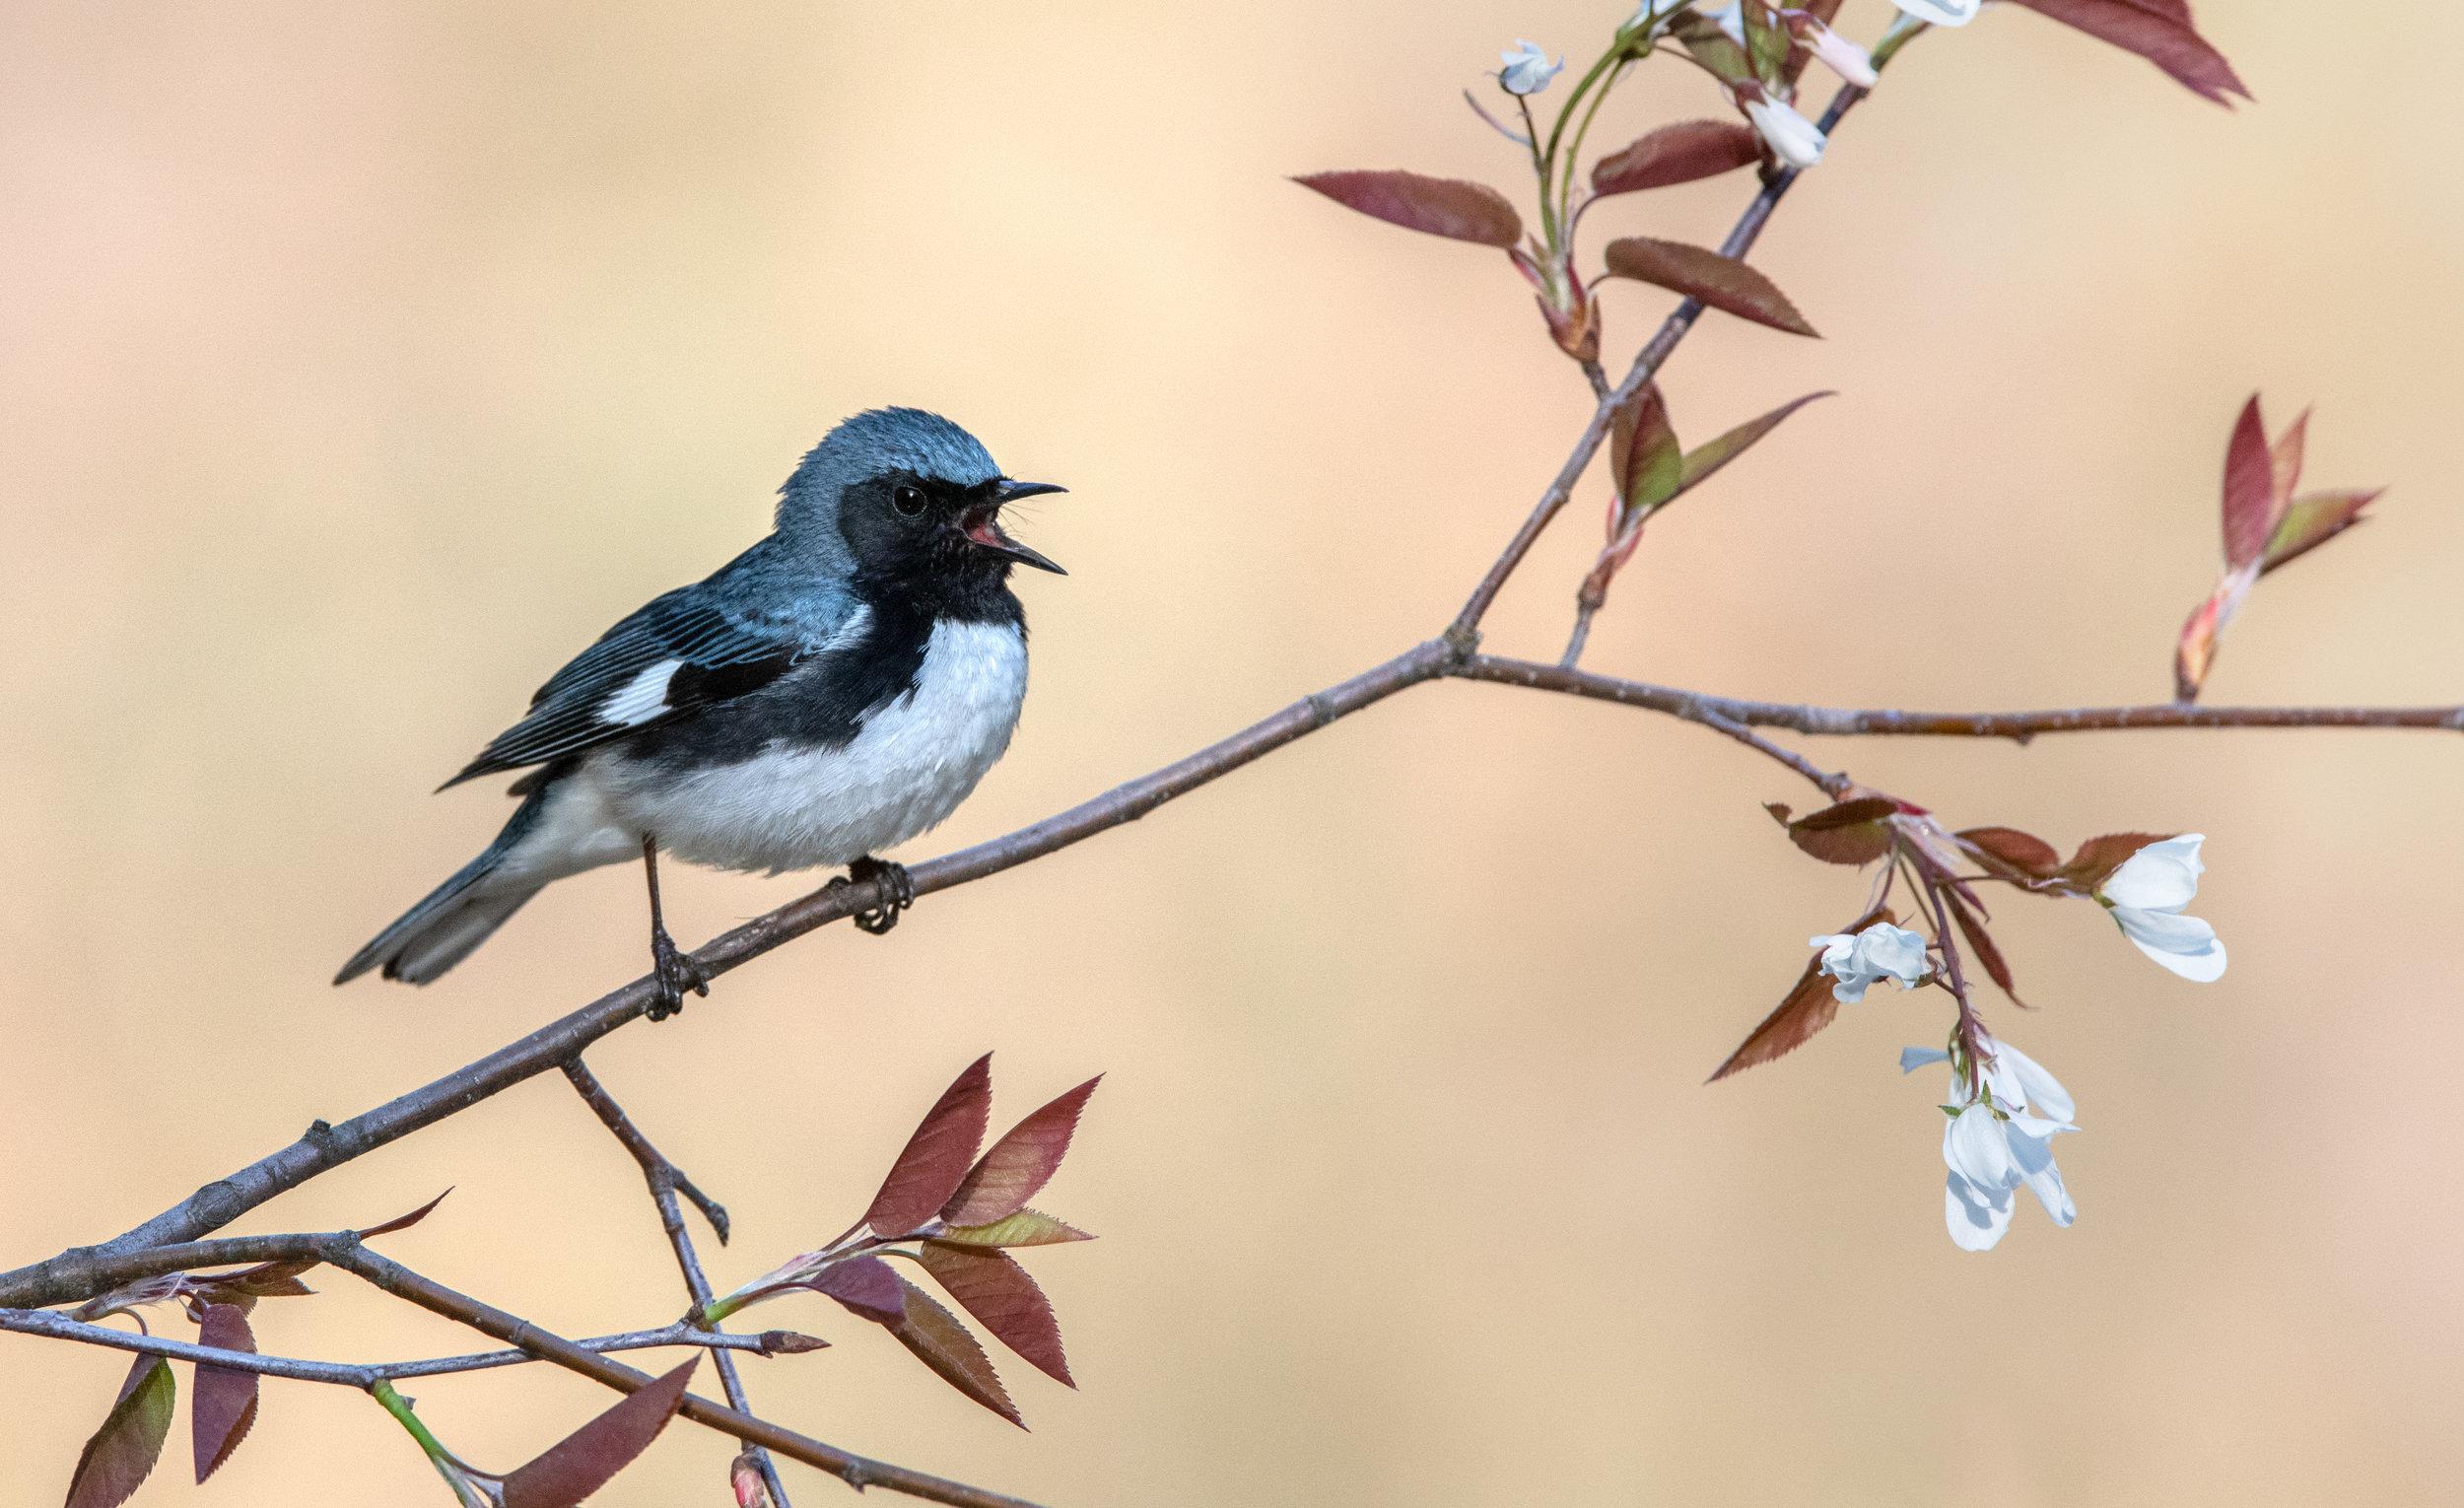 black-throated_blue_warbler_DSC_1982b.jpg